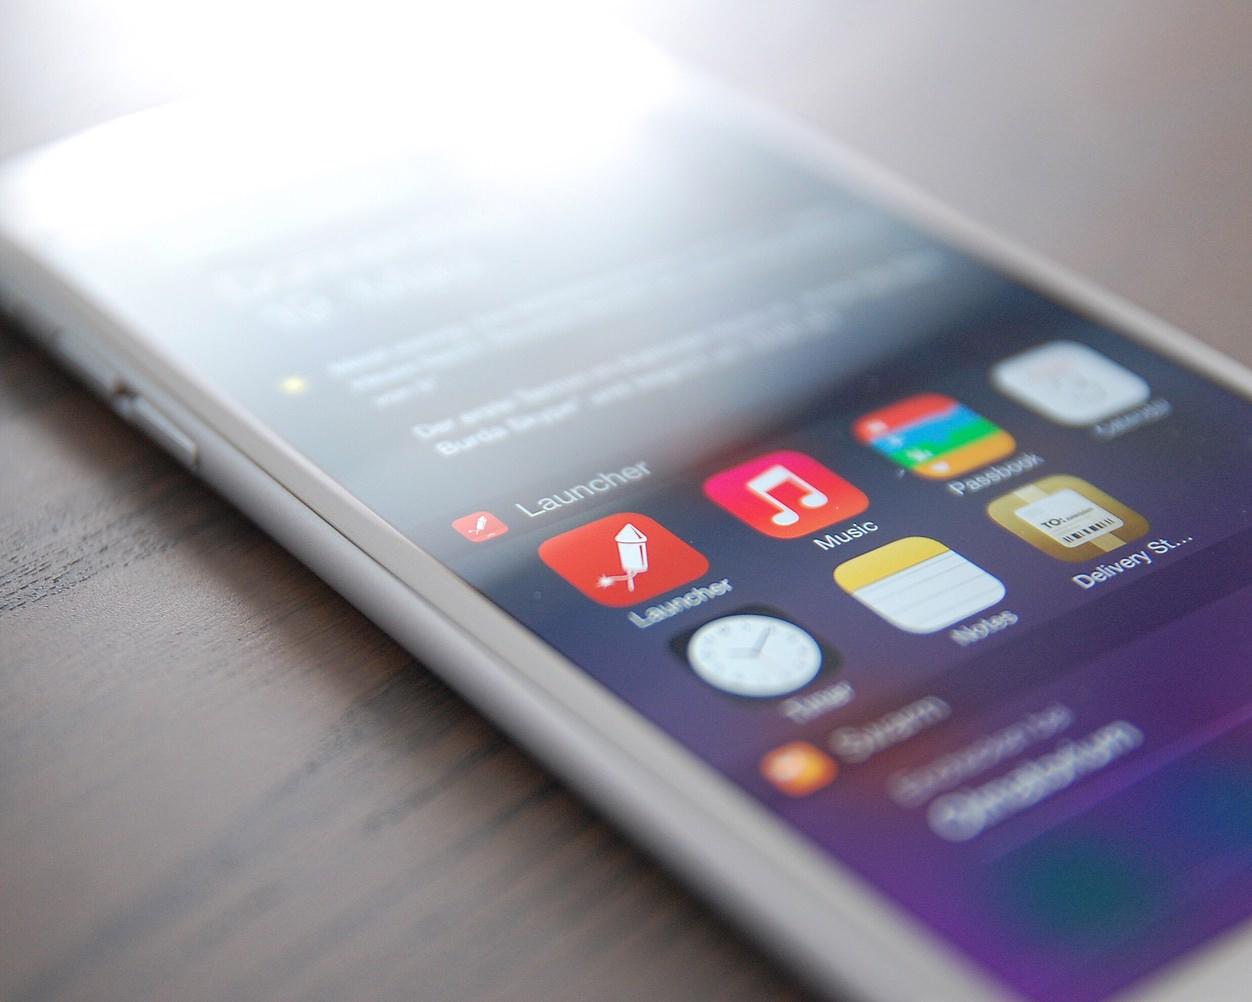 IPhoneBlog de Launcher Lebt